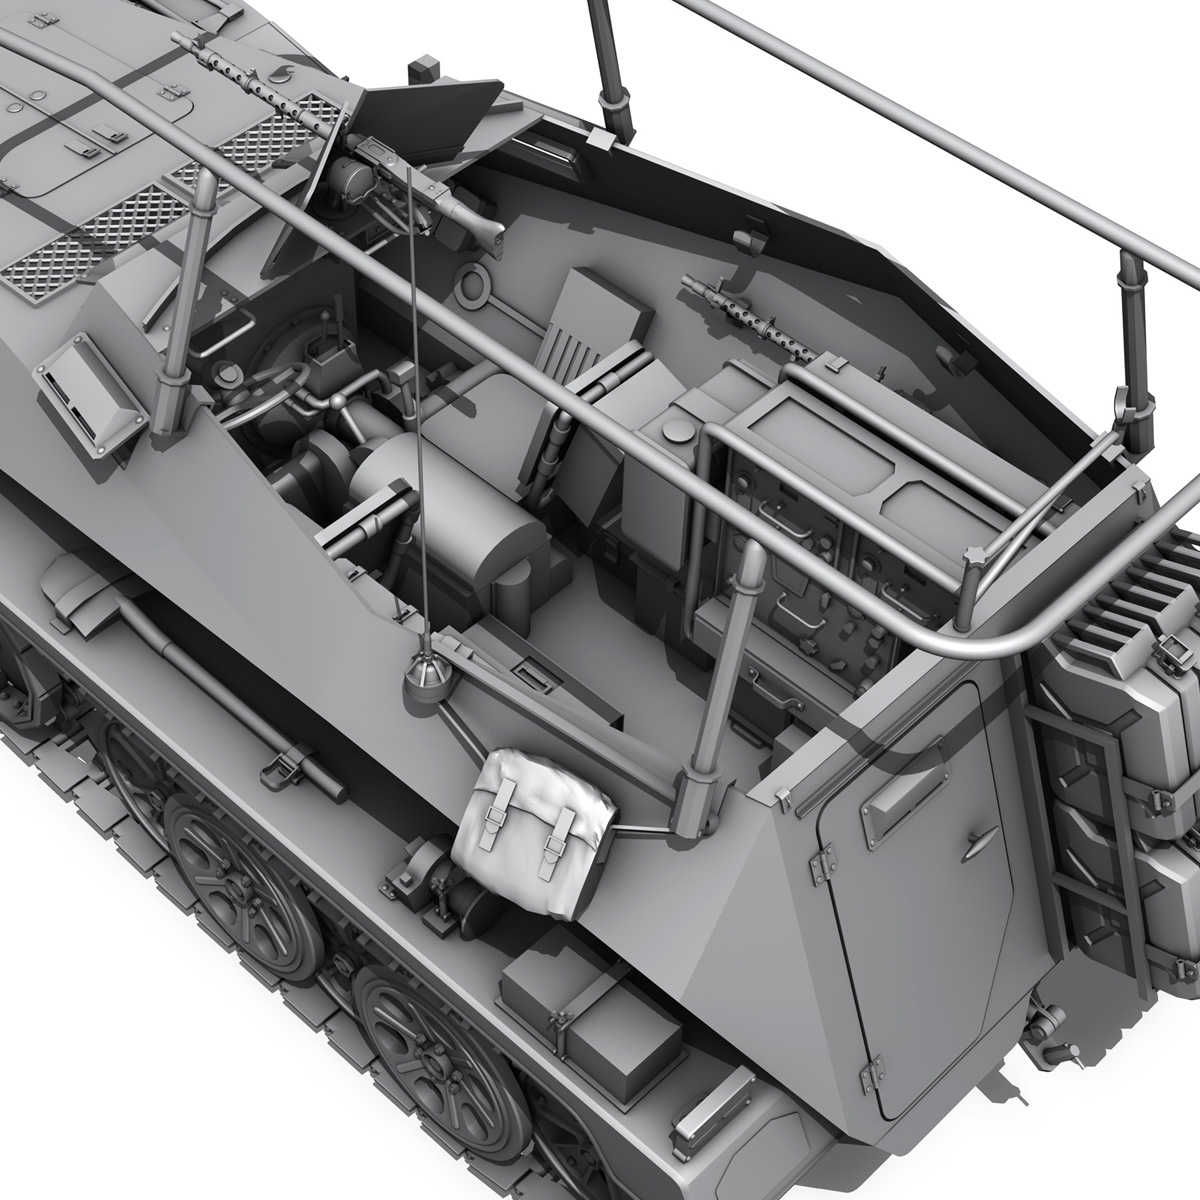 sdkfz 250 – command halftrack 3d model 3ds fbx c4d lwo obj 251676